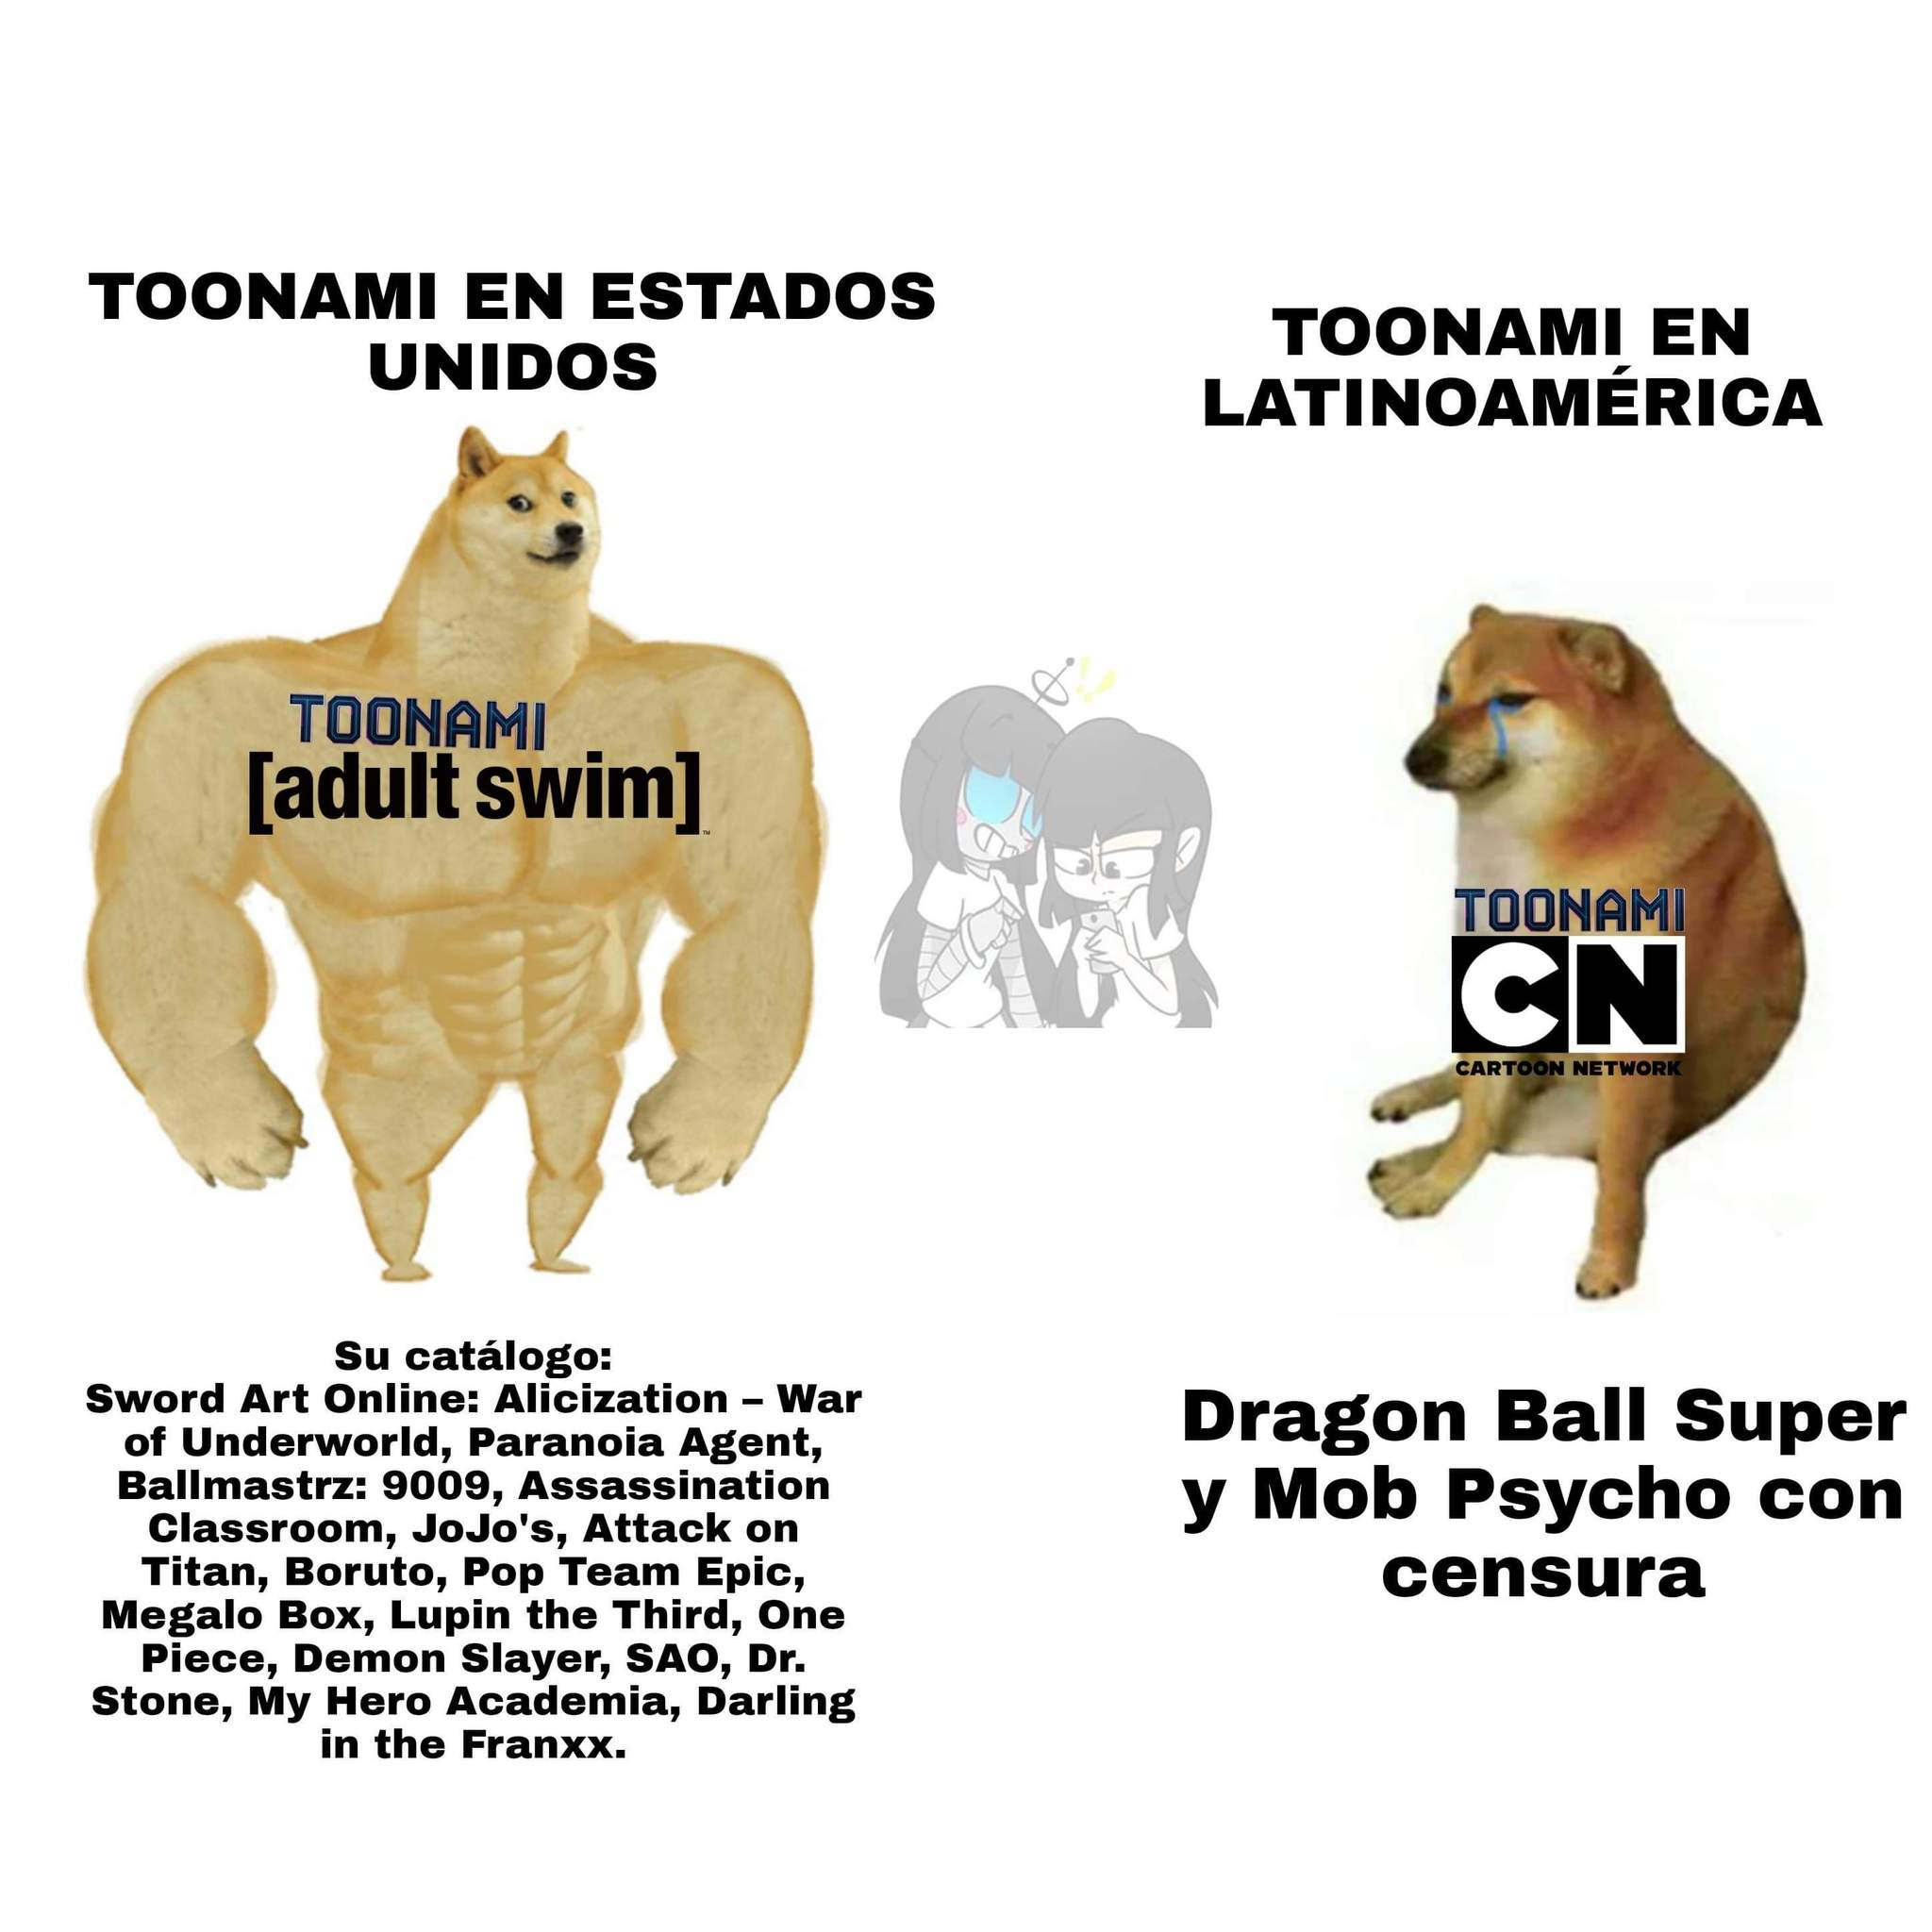 Que pasó Toonami Latinoamérica? Antes eras chévere :( - meme